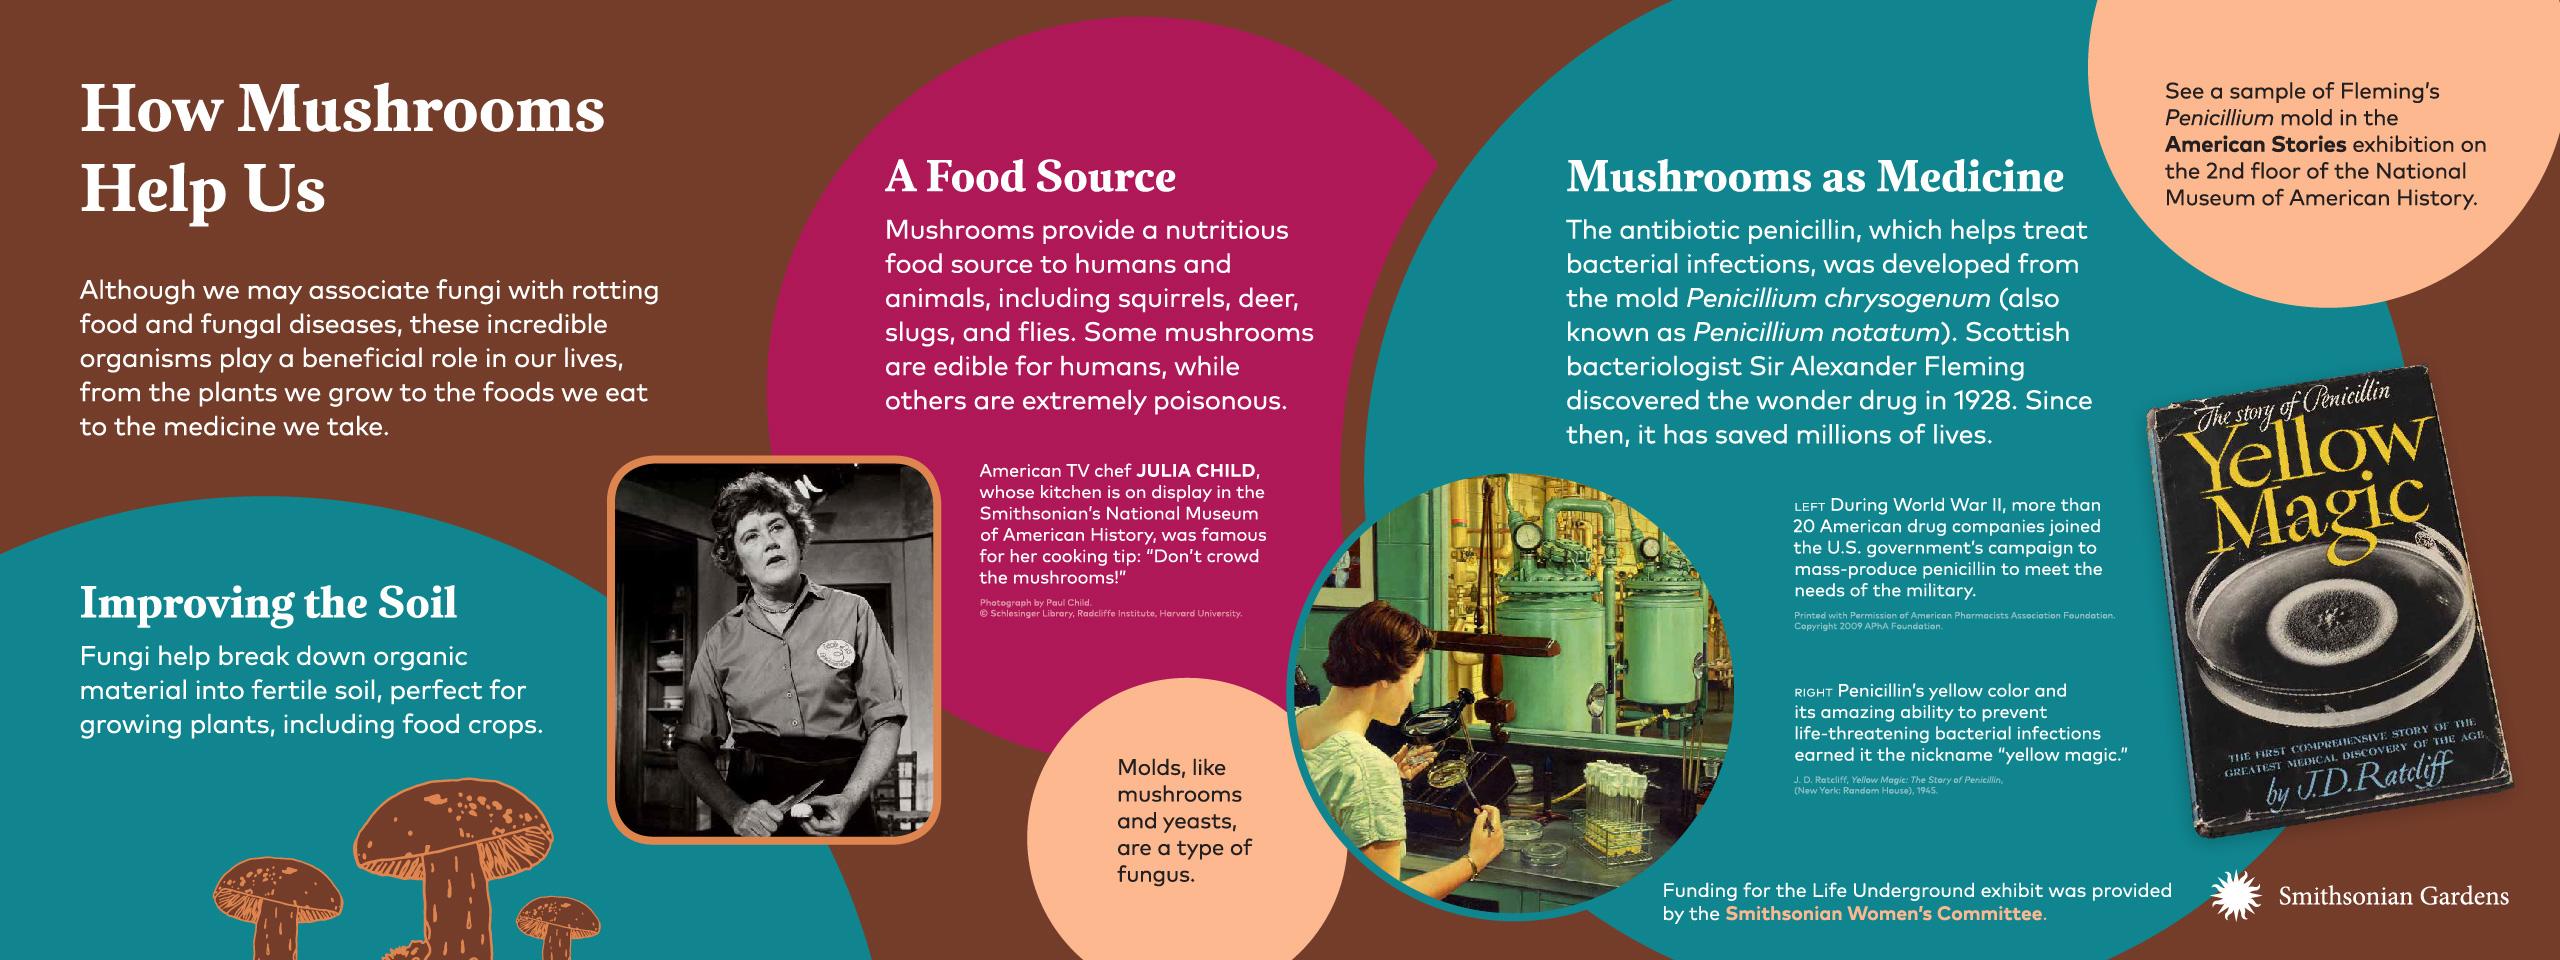 How Mushrooms Help Us exhibit panel